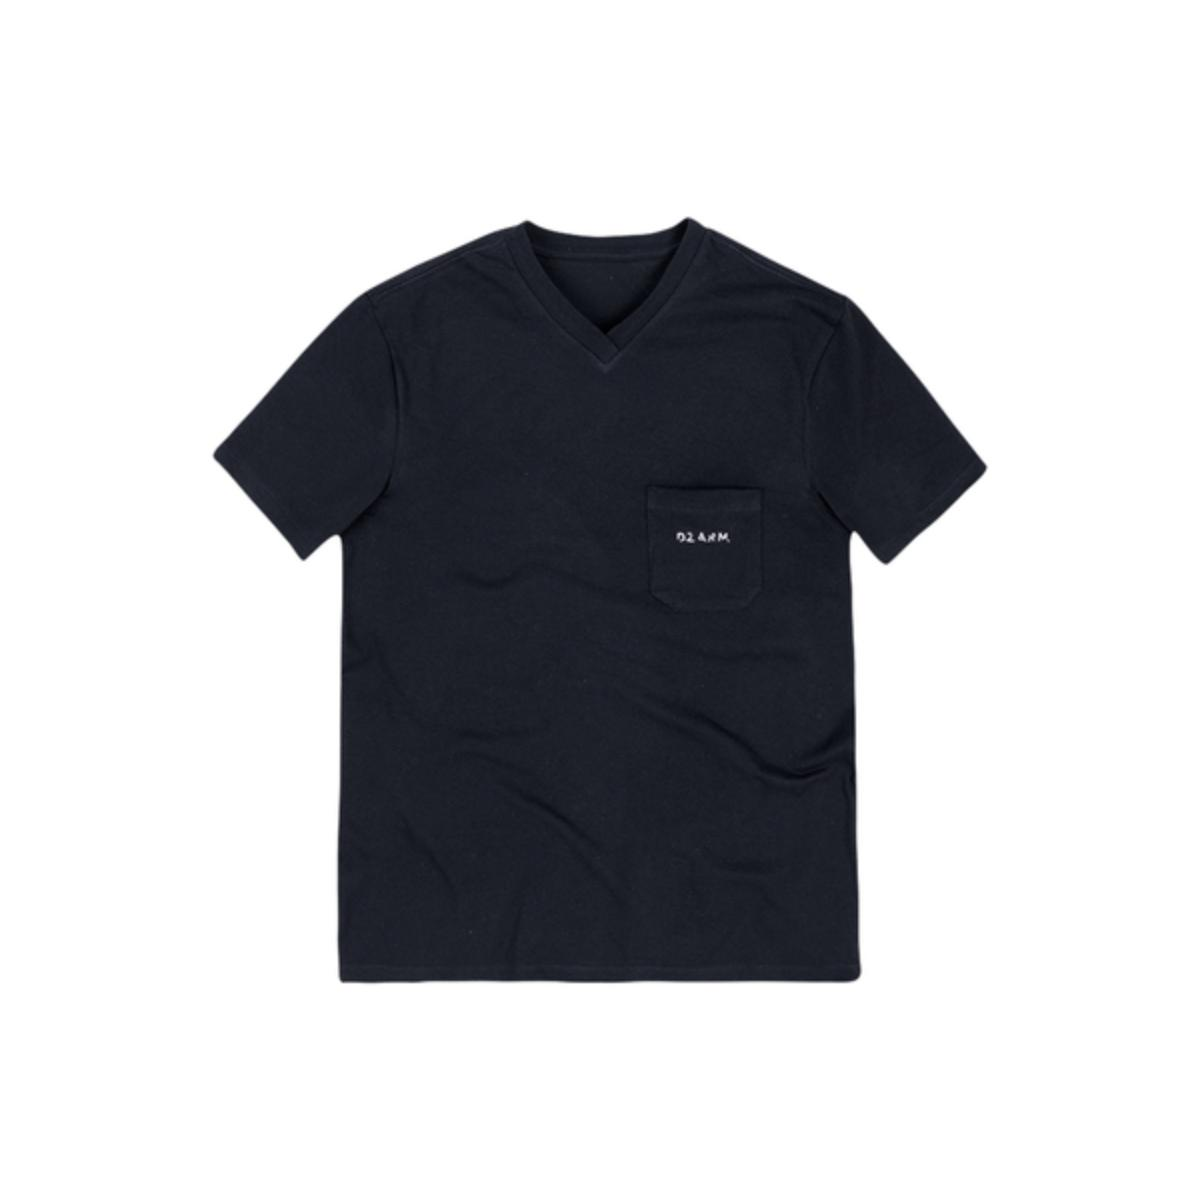 Camiseta Masculina Dzarm 6rmd N10en Preto